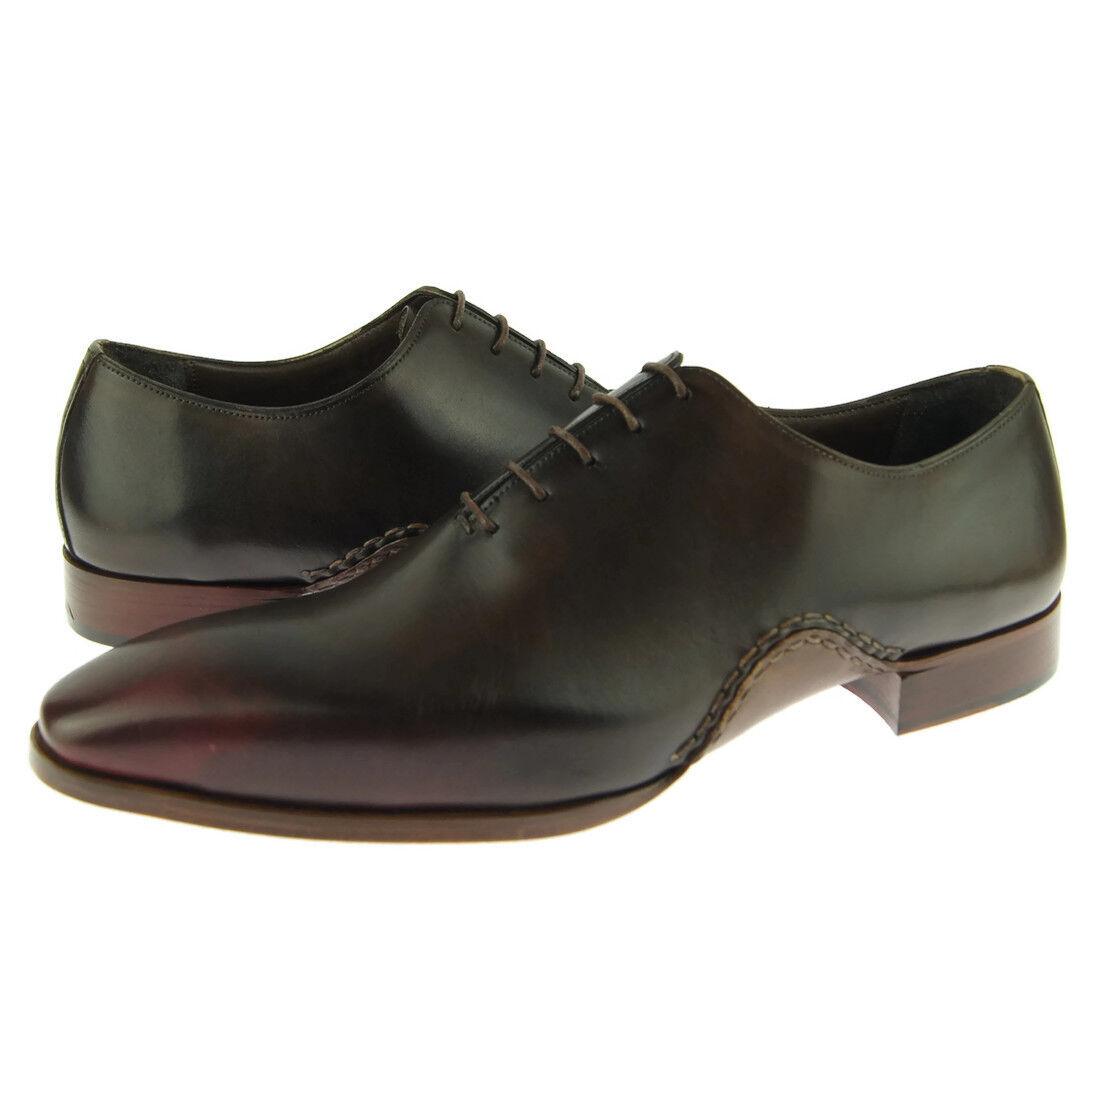 Fertini 8805 Plain Wholecut Oxford, Men's Dress Leather scarpe, Marroneee Burgundy